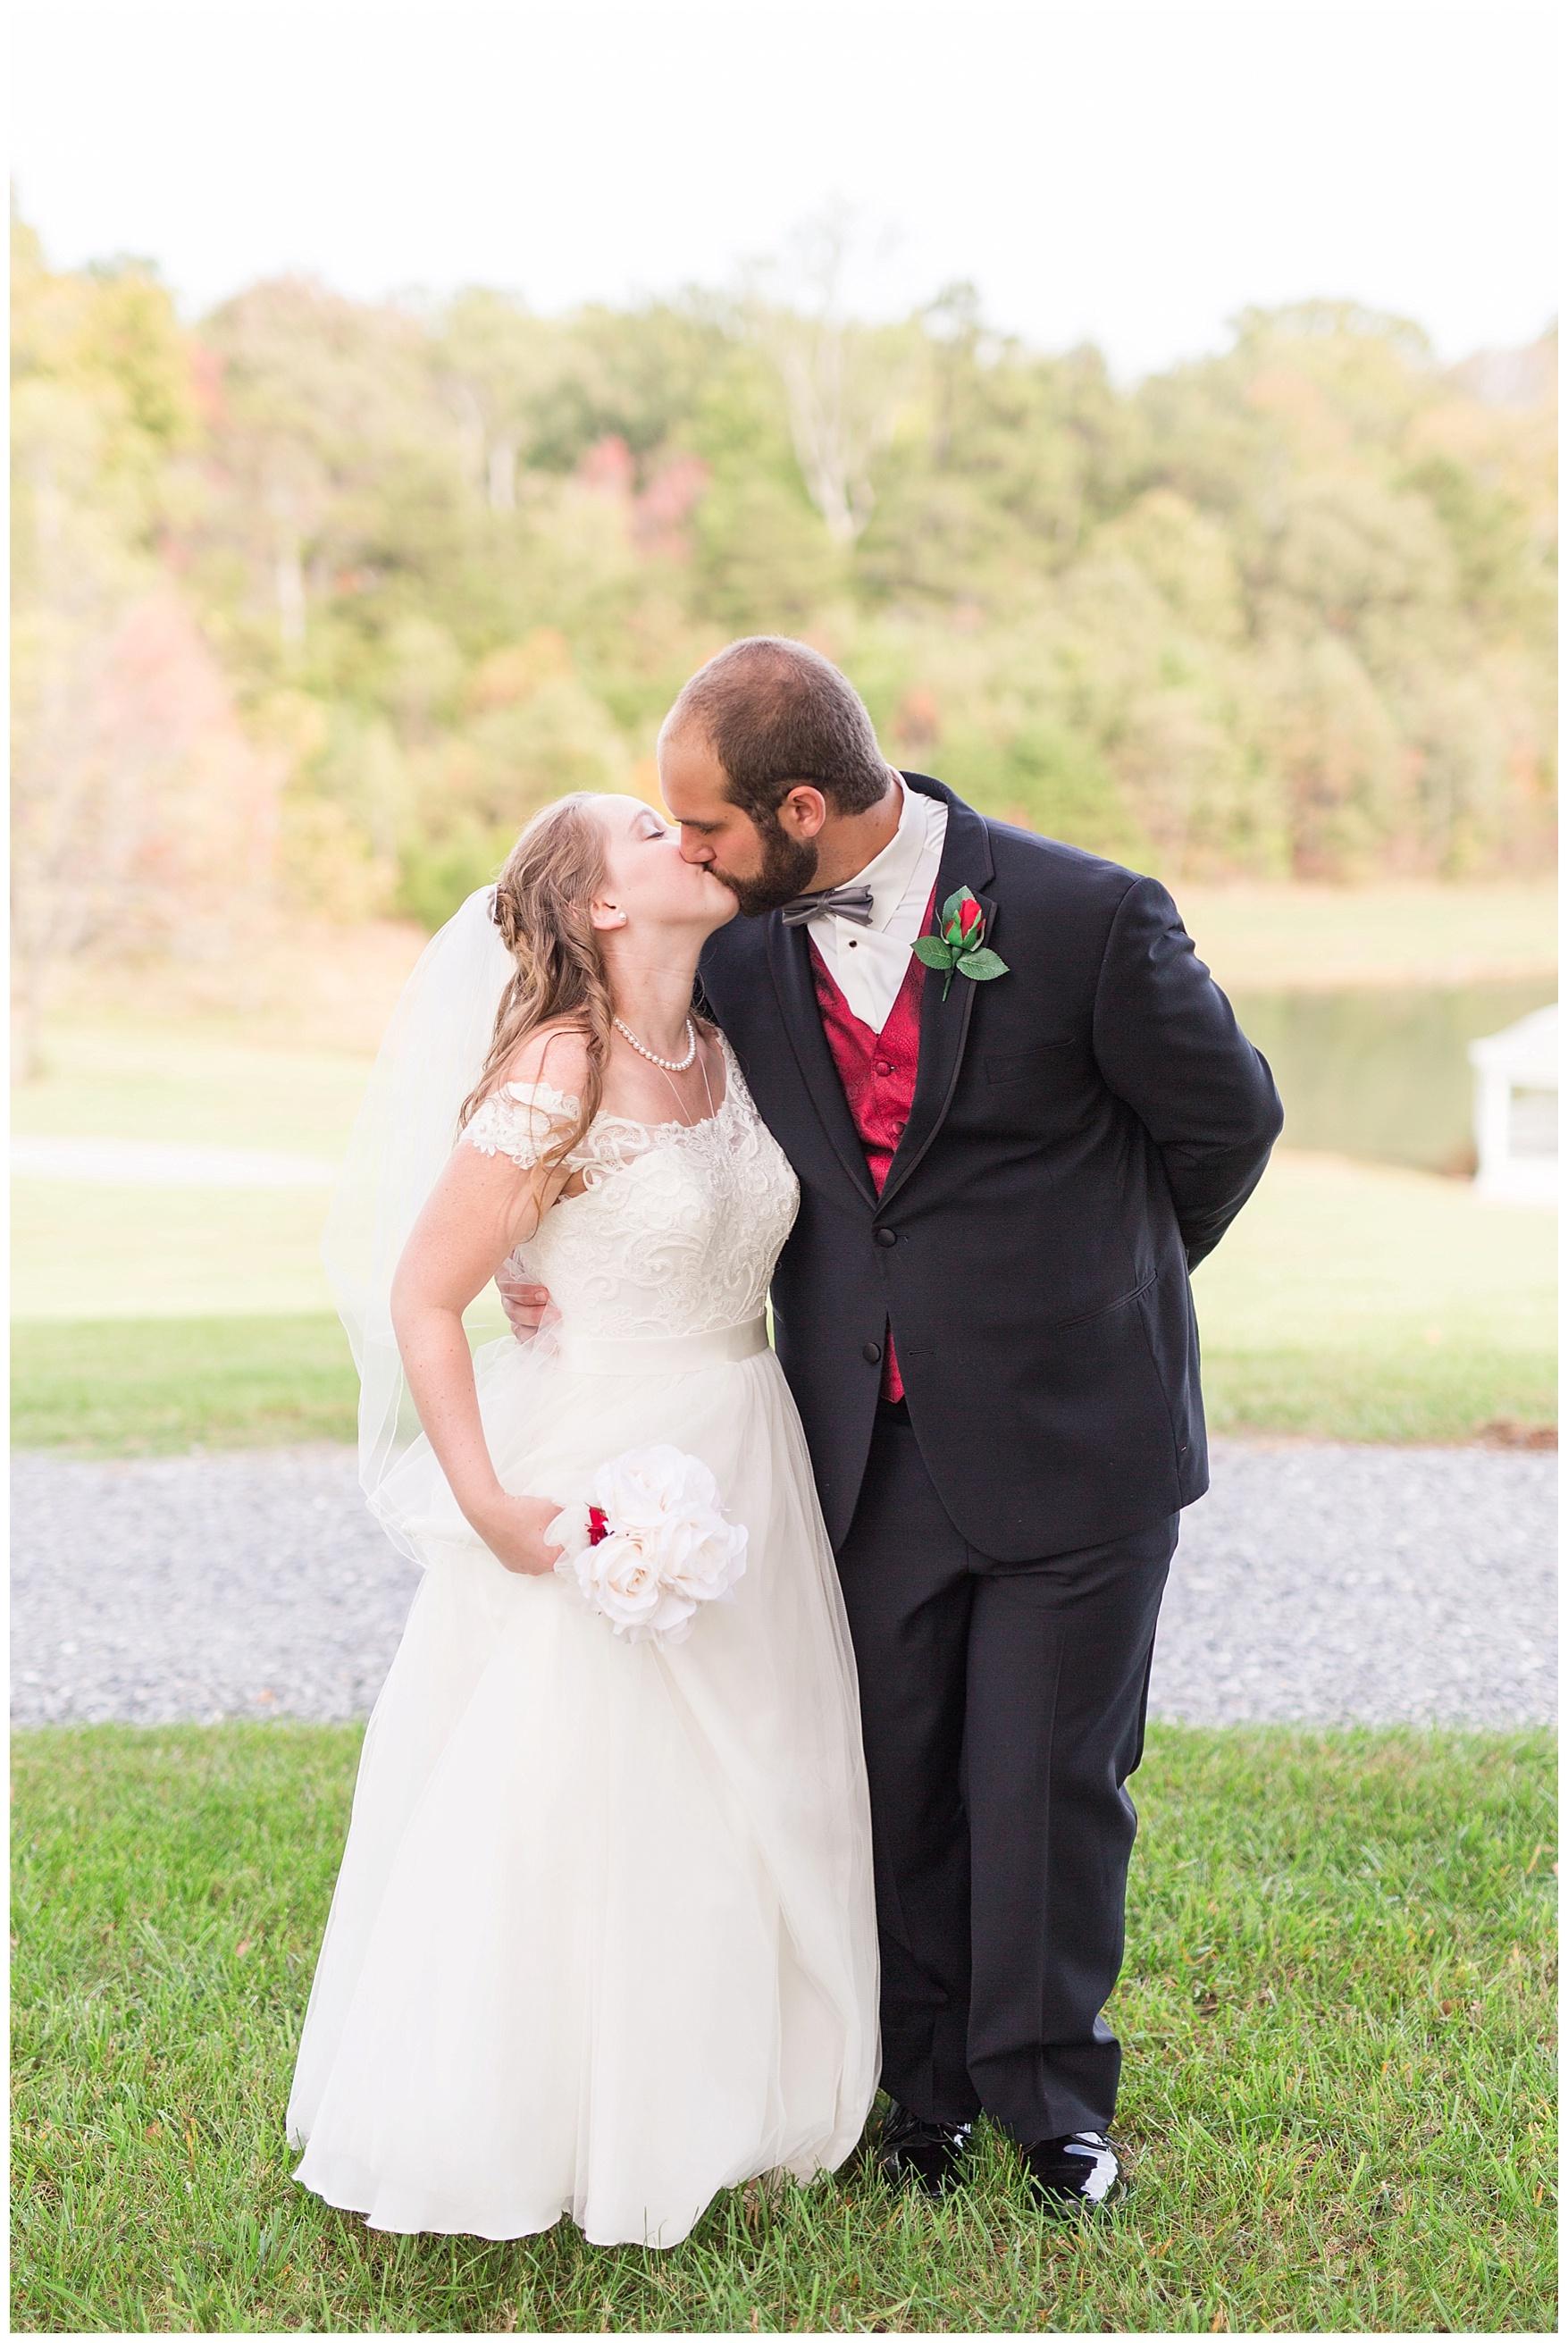 Lynchburg and Charlottesville Wedding Photographer || Trivium Estate Wedding || www.ashleyeiban.com